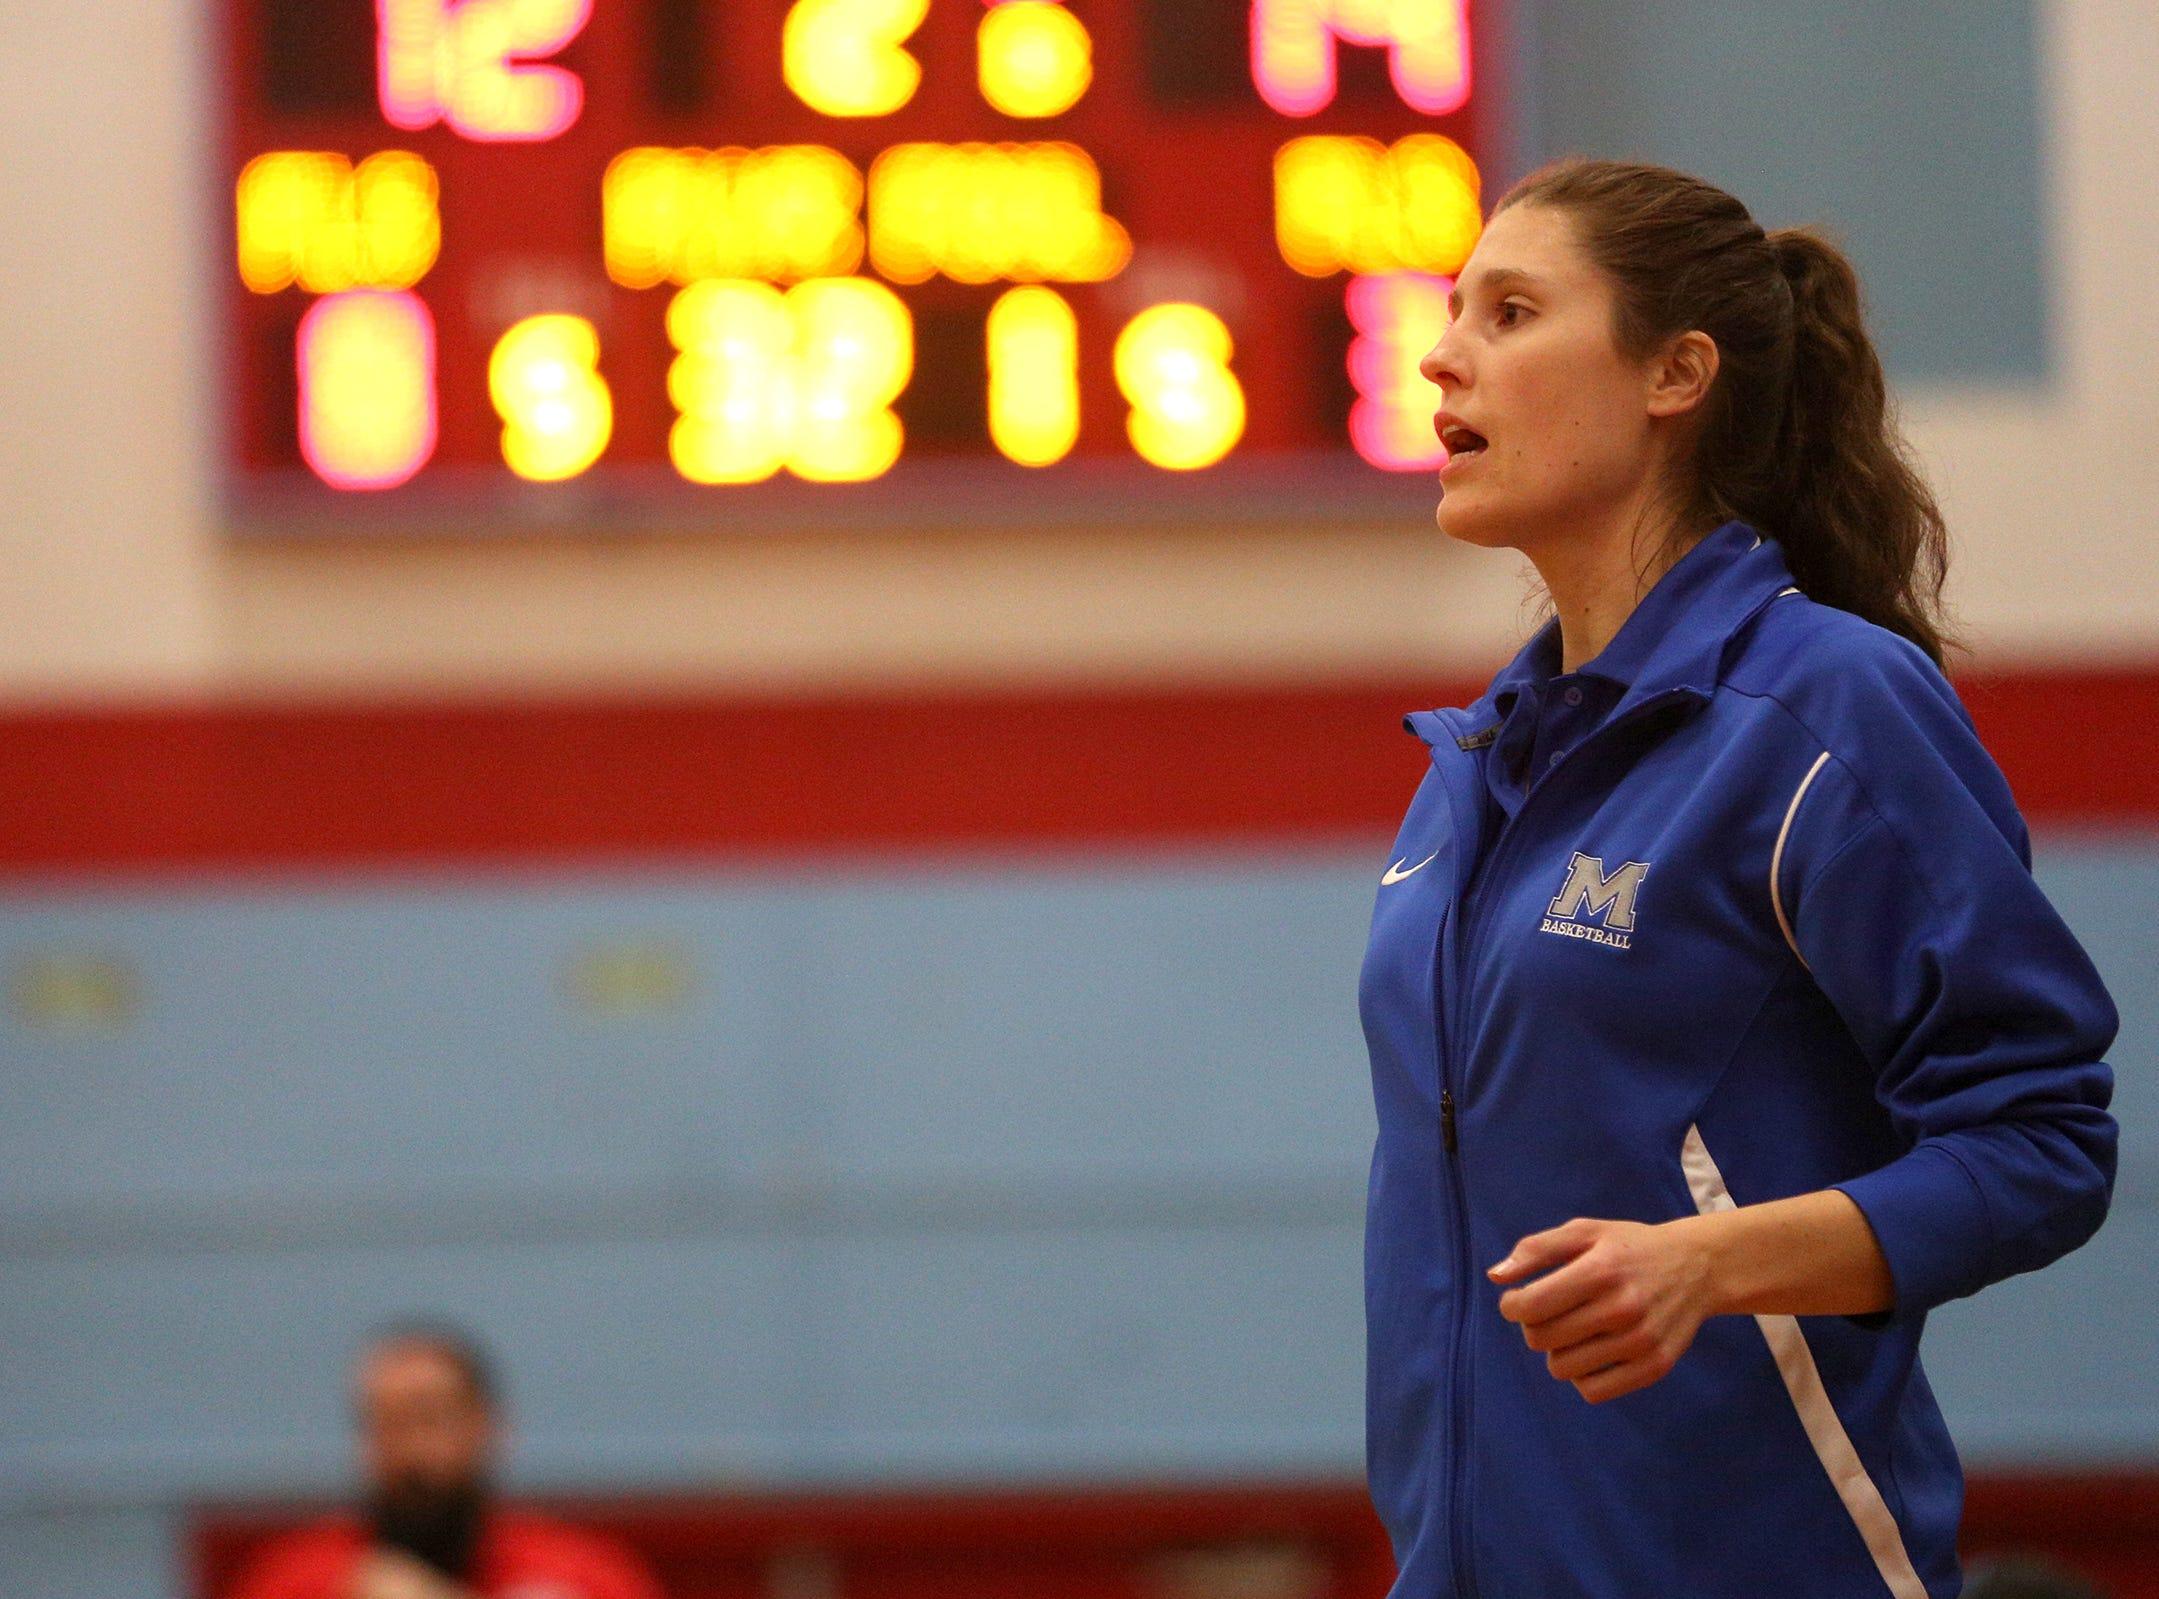 McNary's head coach Elizabeth Doran during the South Salem High School girls basketball game against McNary High School in Salem on Thursday, Jan. 31, 2019.